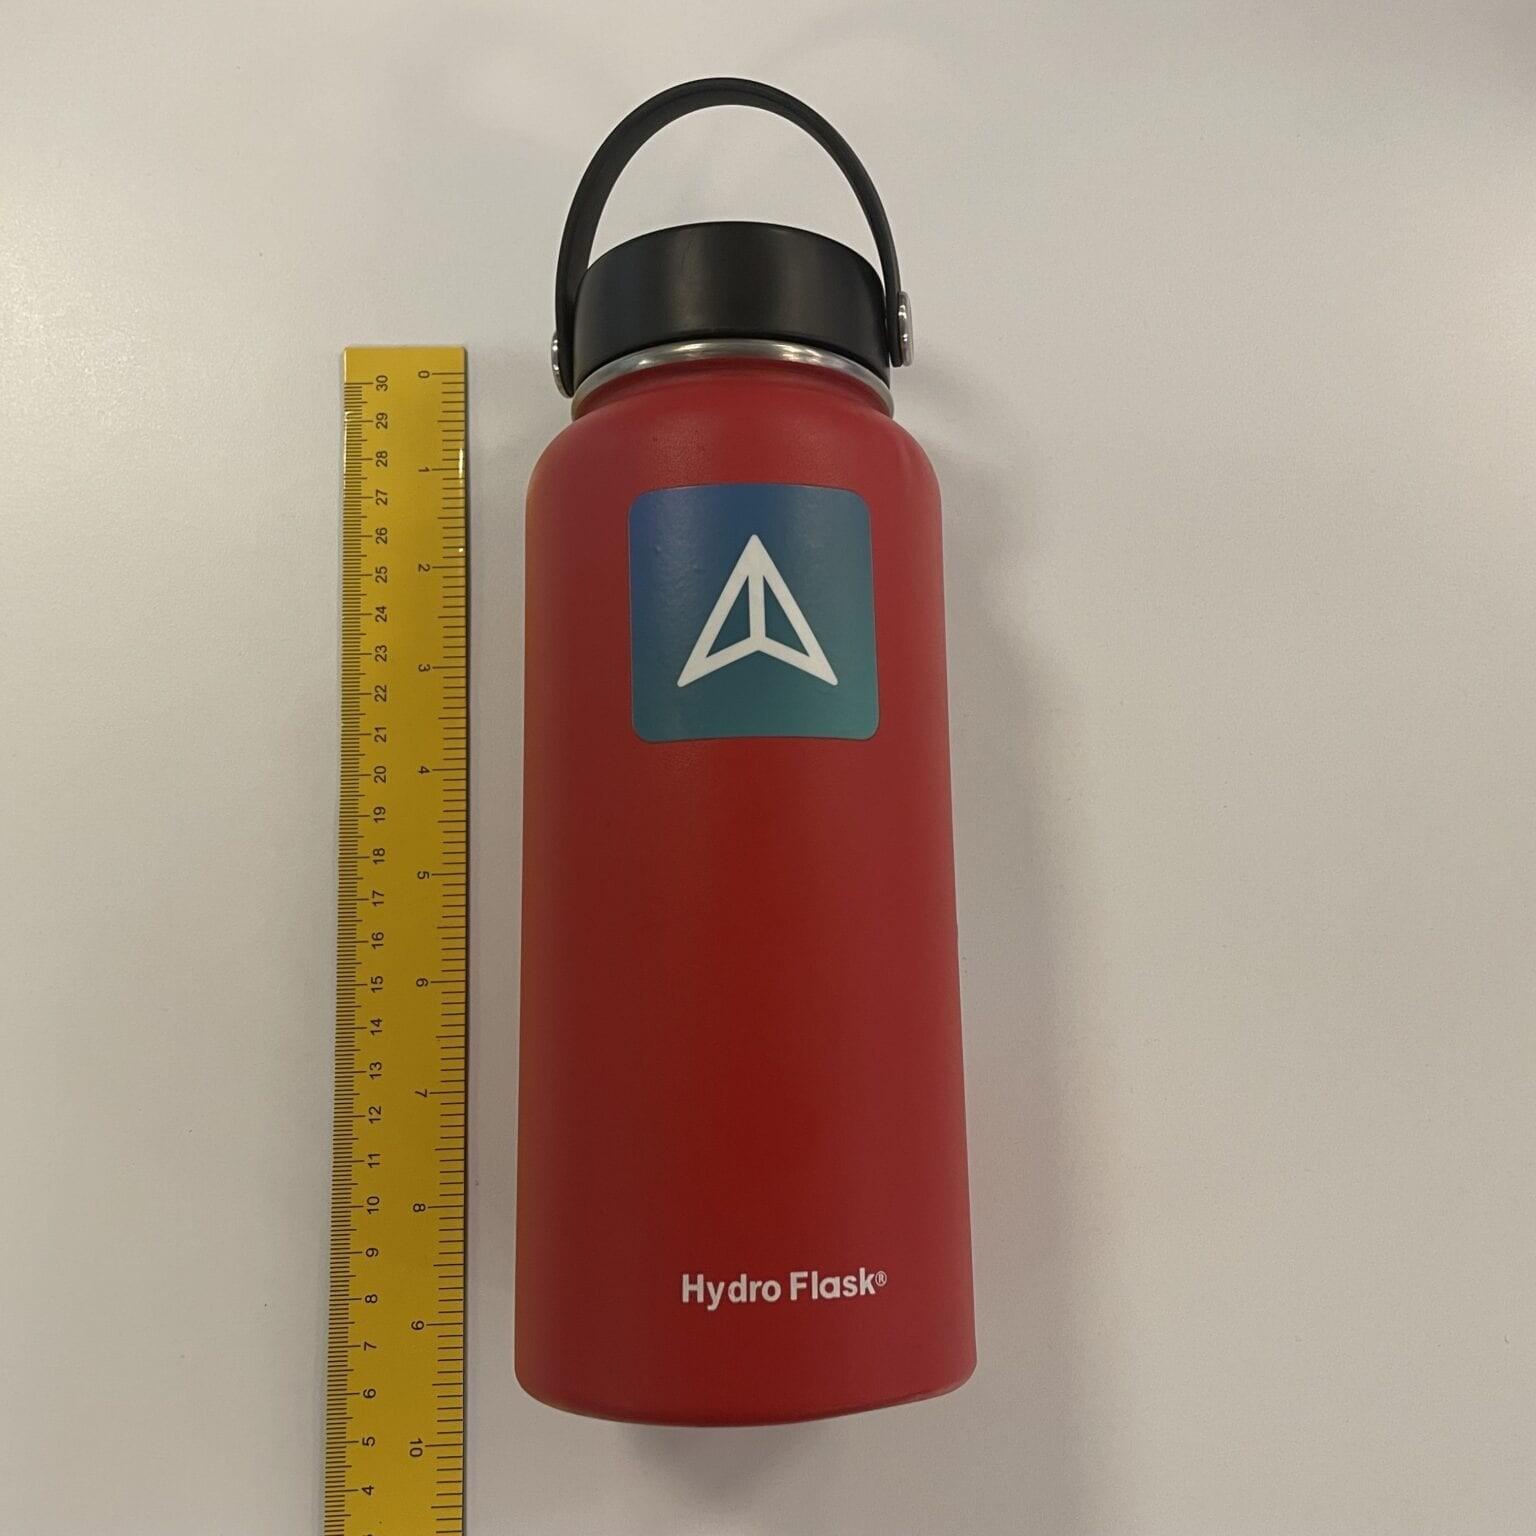 water bottle being measured